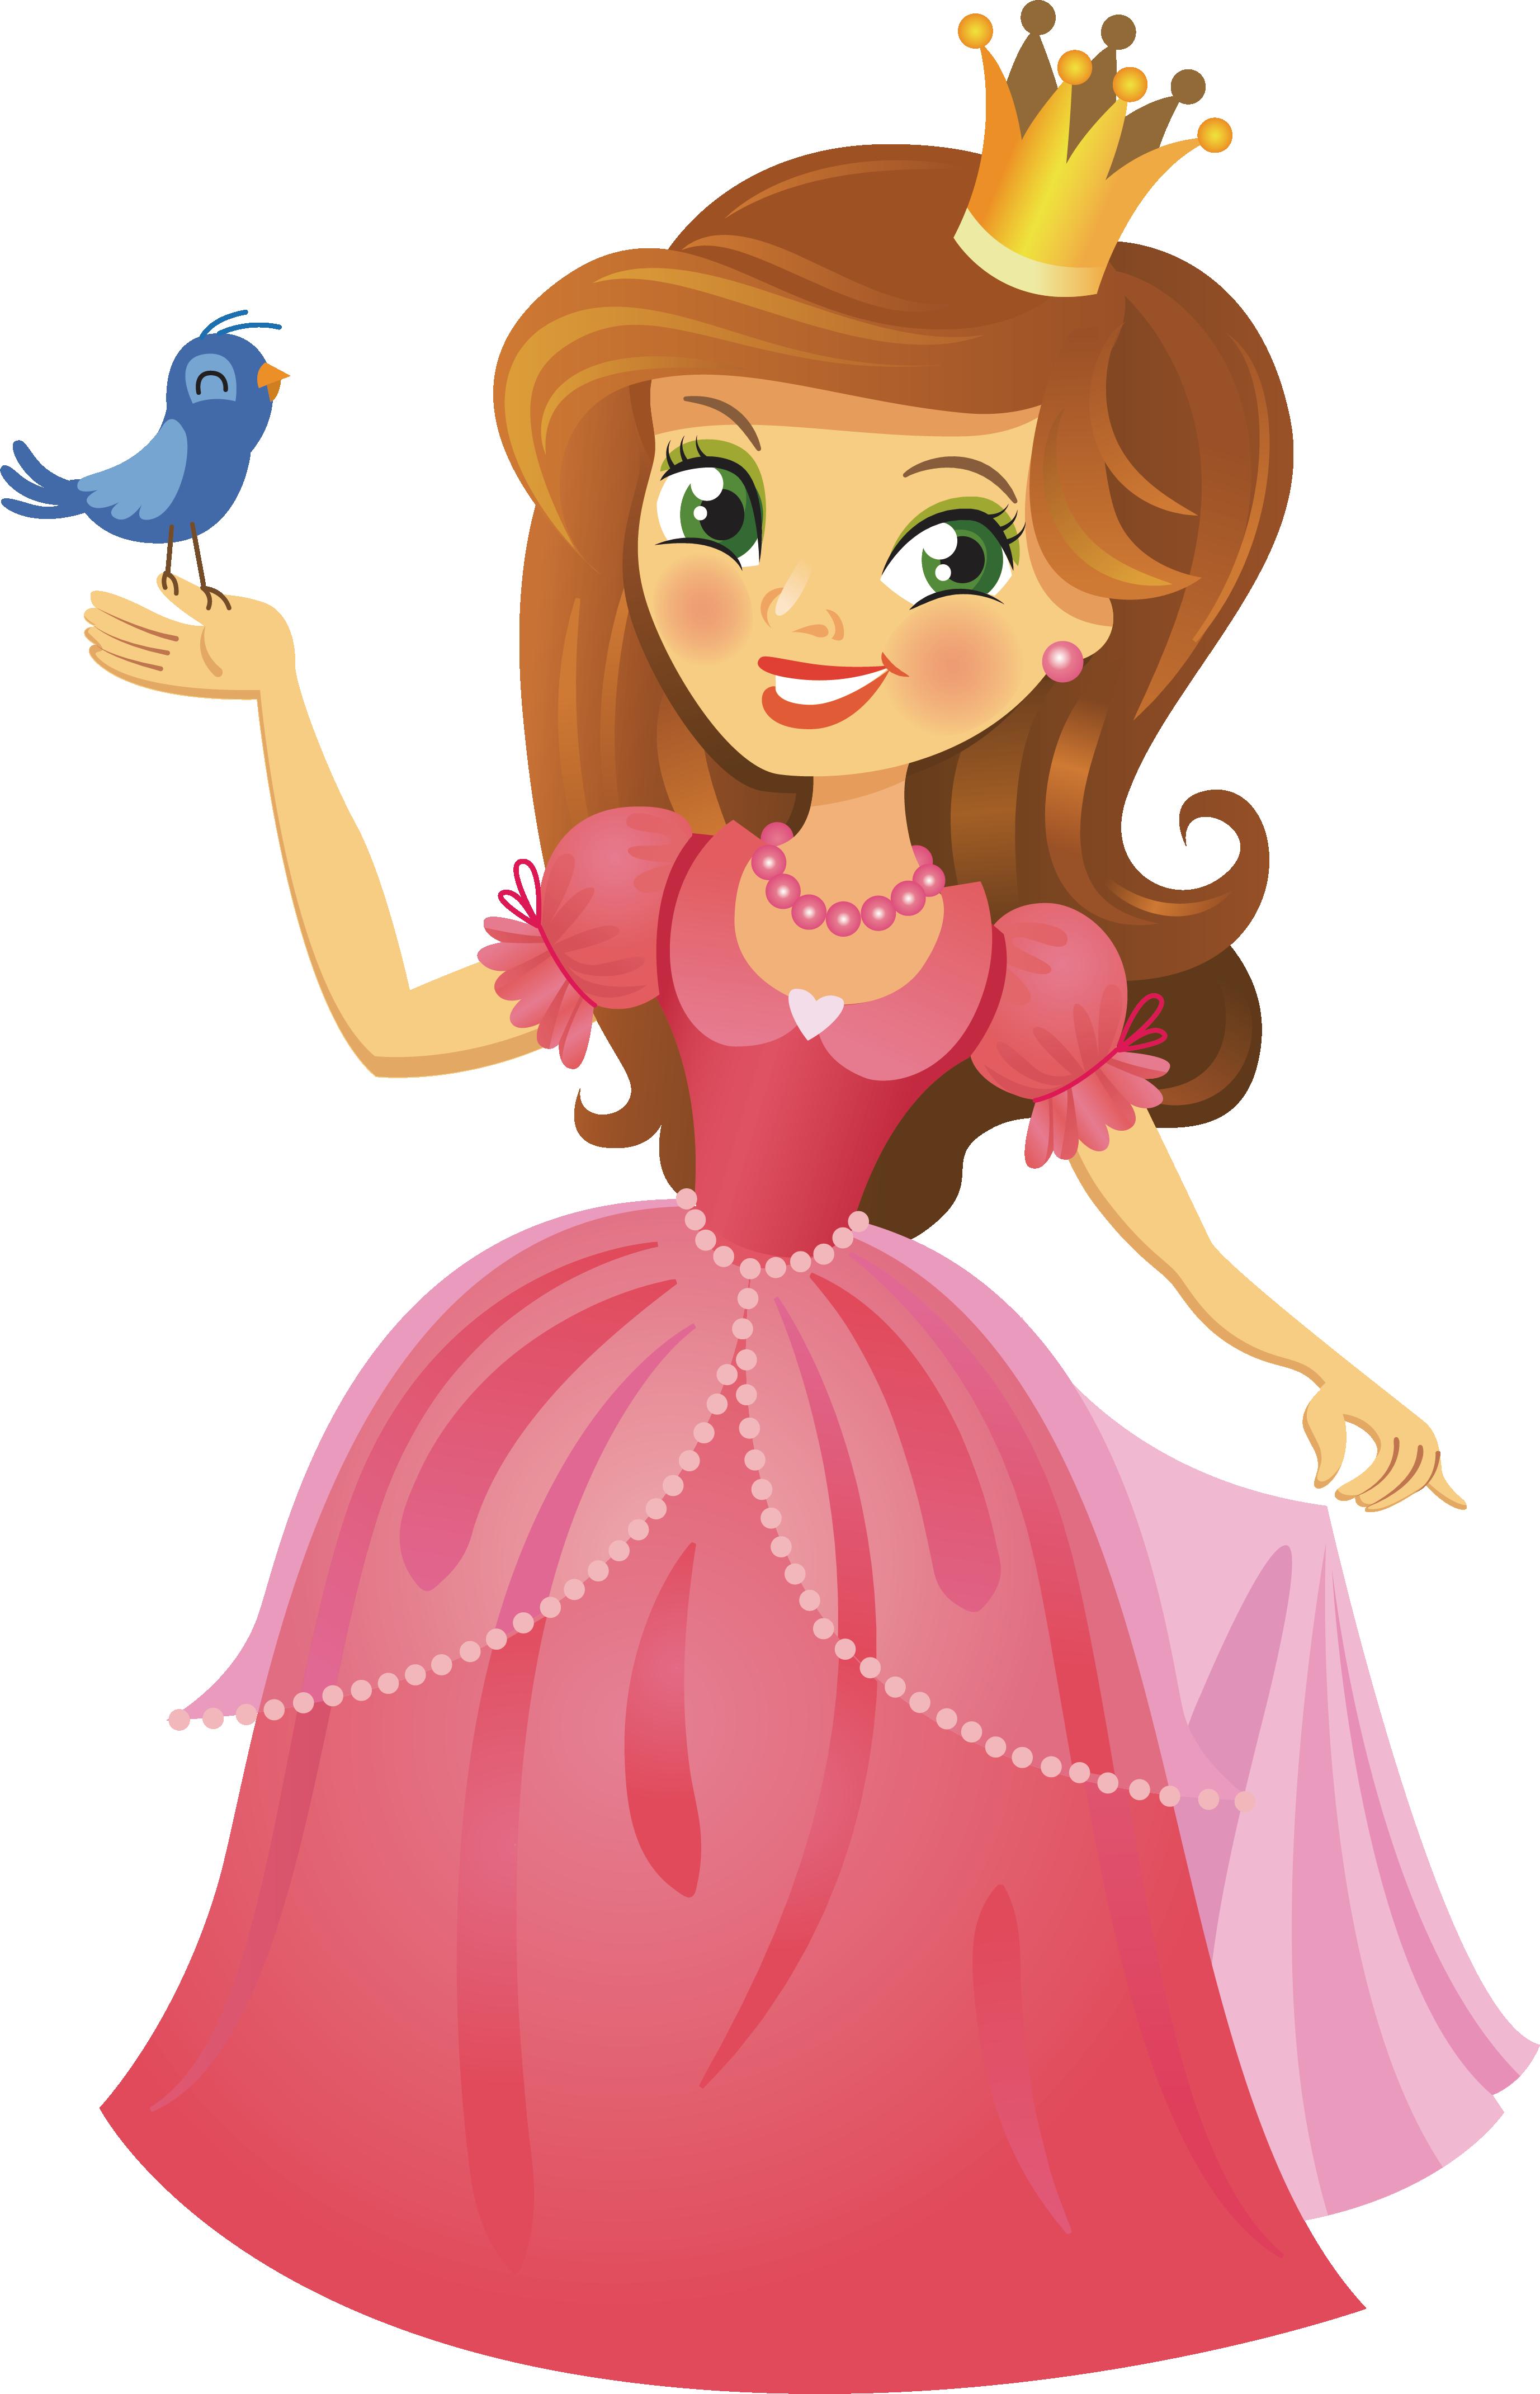 Fairytale clipart princess birthday. Wedding invitation greeting card